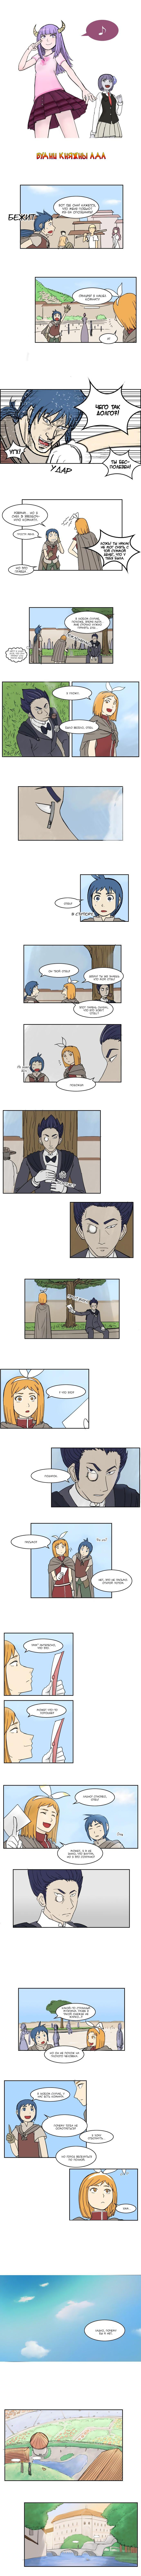 https://r2.ninemanga.com/comics/pic3/23/27095/1295314/1546372633896.jpg Page 1